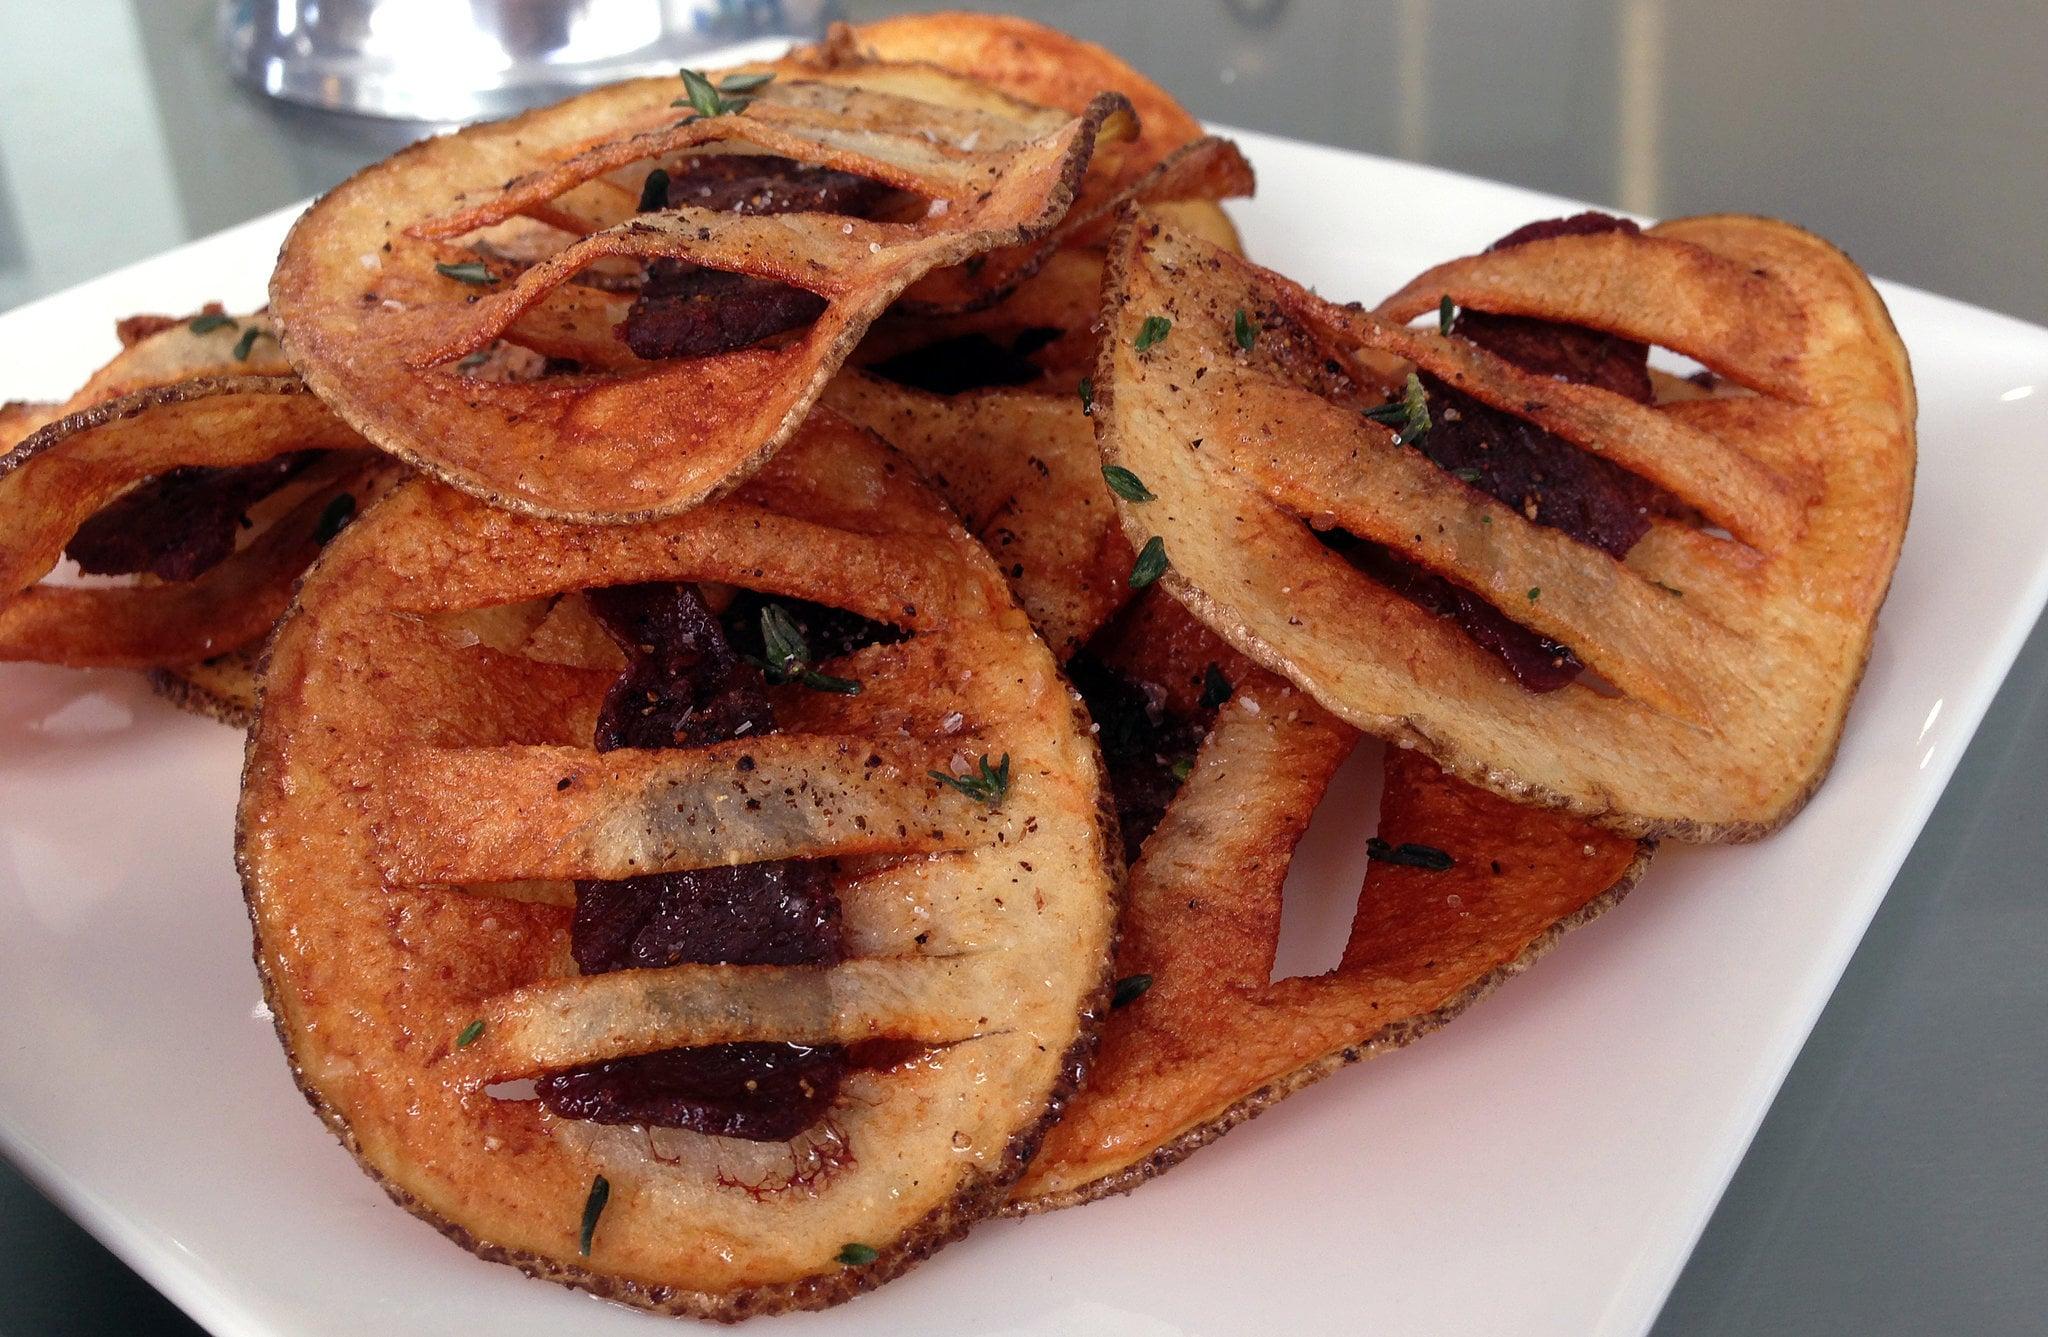 Steak-Stuffed Potato Chips